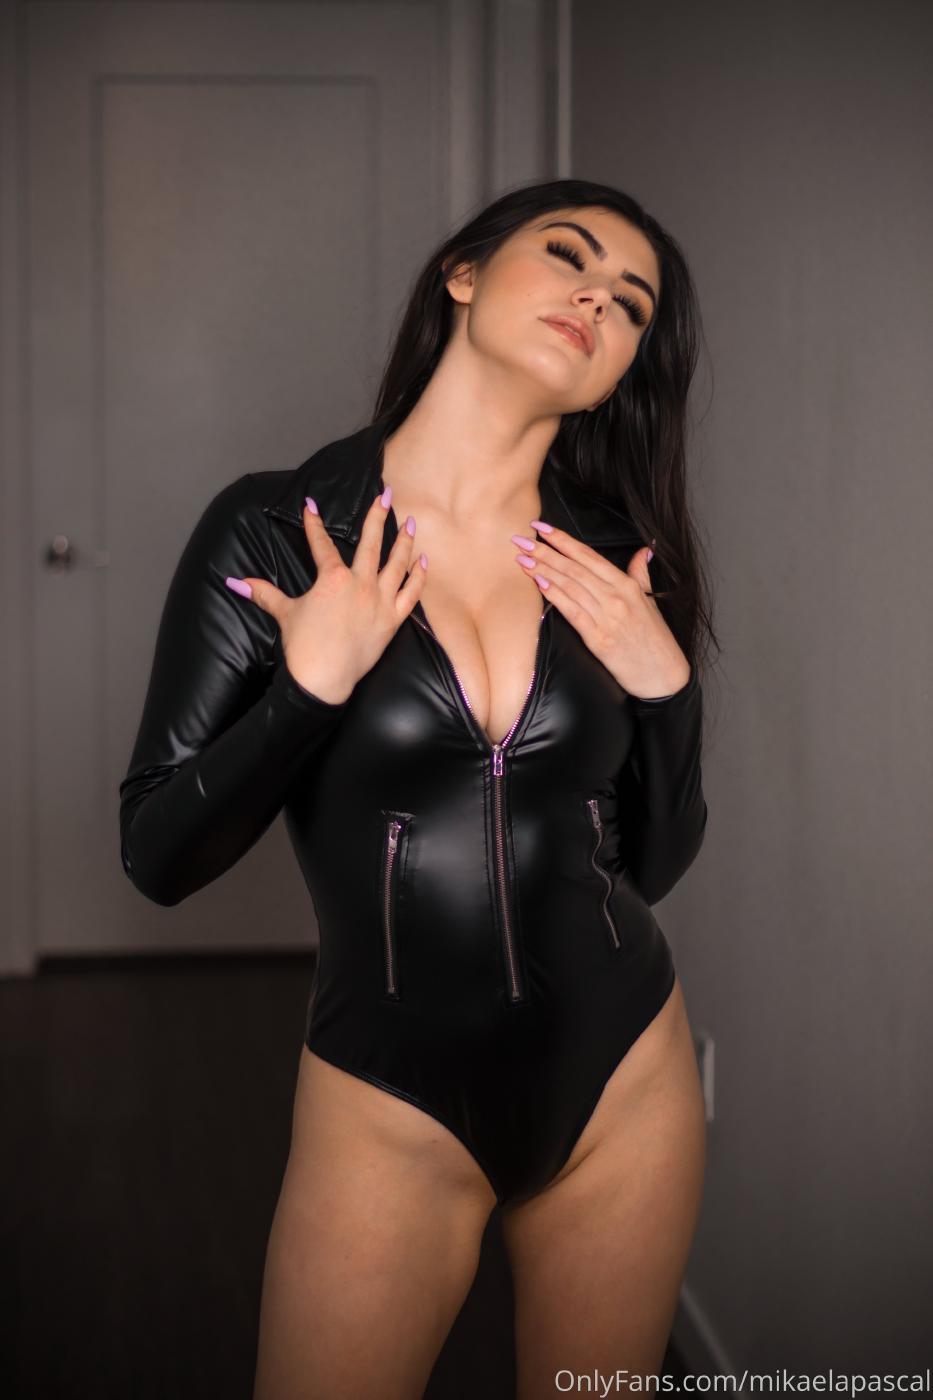 Mikaela Pascal Sexy Leather Bodysuit Onlyfans Set Leaked 0008